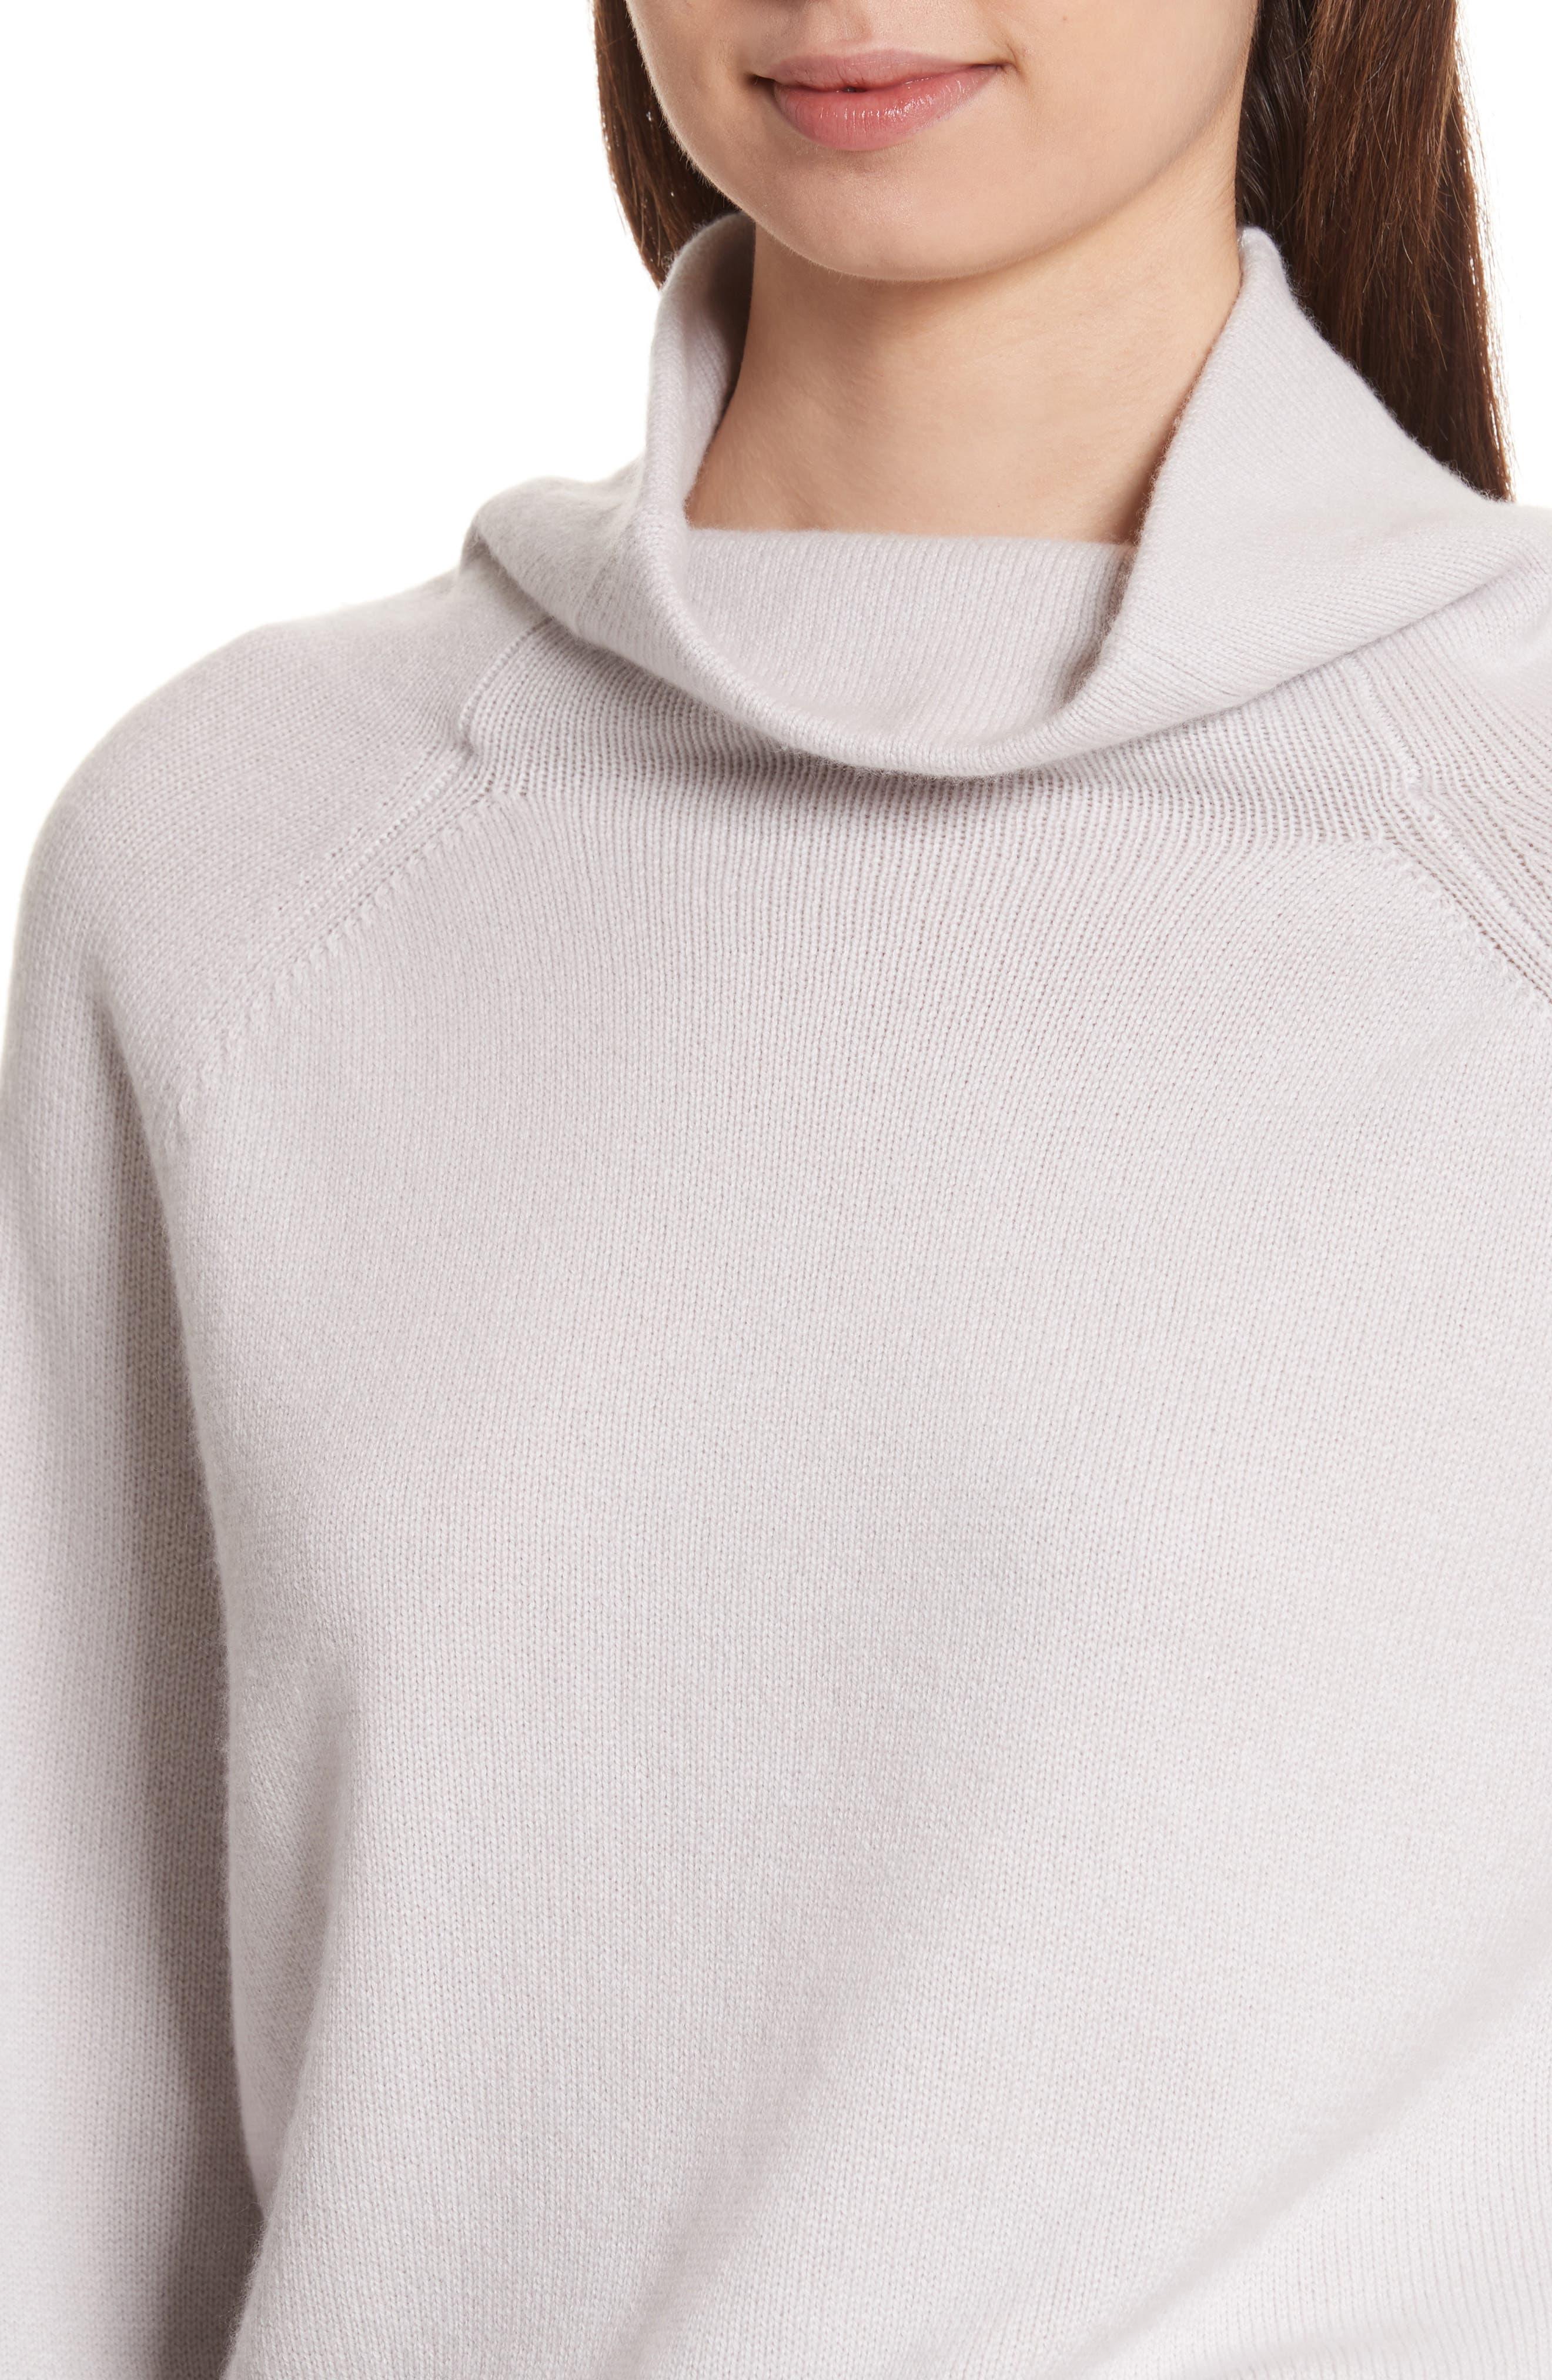 Balloon Sleeve Cashmere Turtleneck Sweater,                             Alternate thumbnail 4, color,                             020